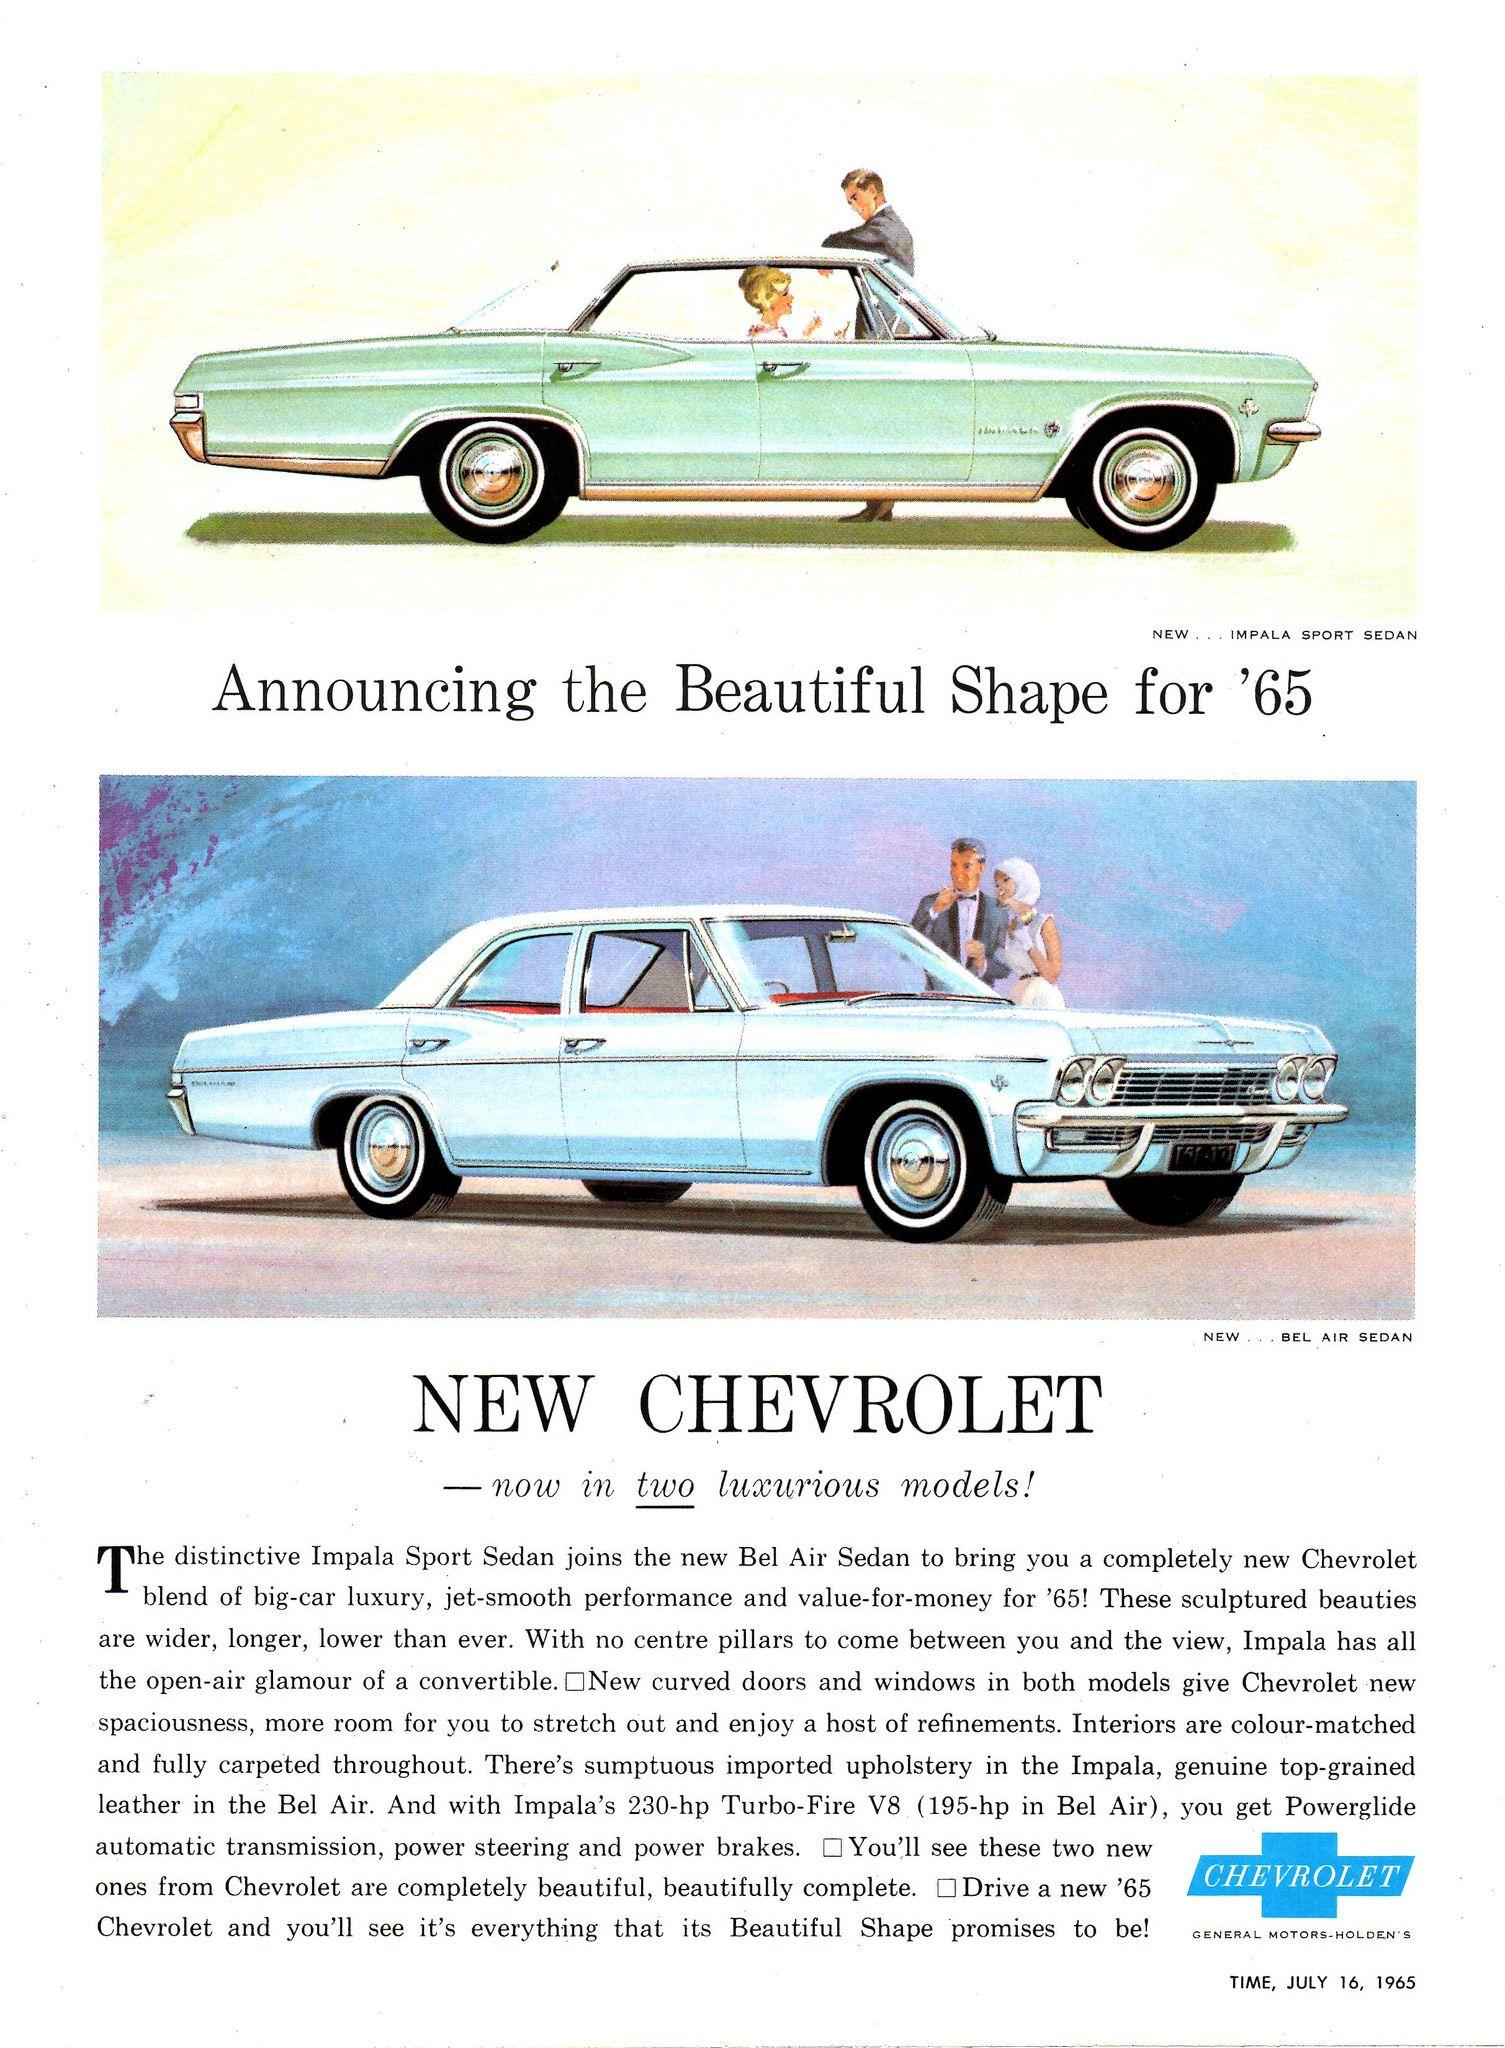 1965 Chevrolet Bel Air Sedan Impala Sport Sedan Aussie Original Magazine Advertisement New Impala Bel Air Chevrolet